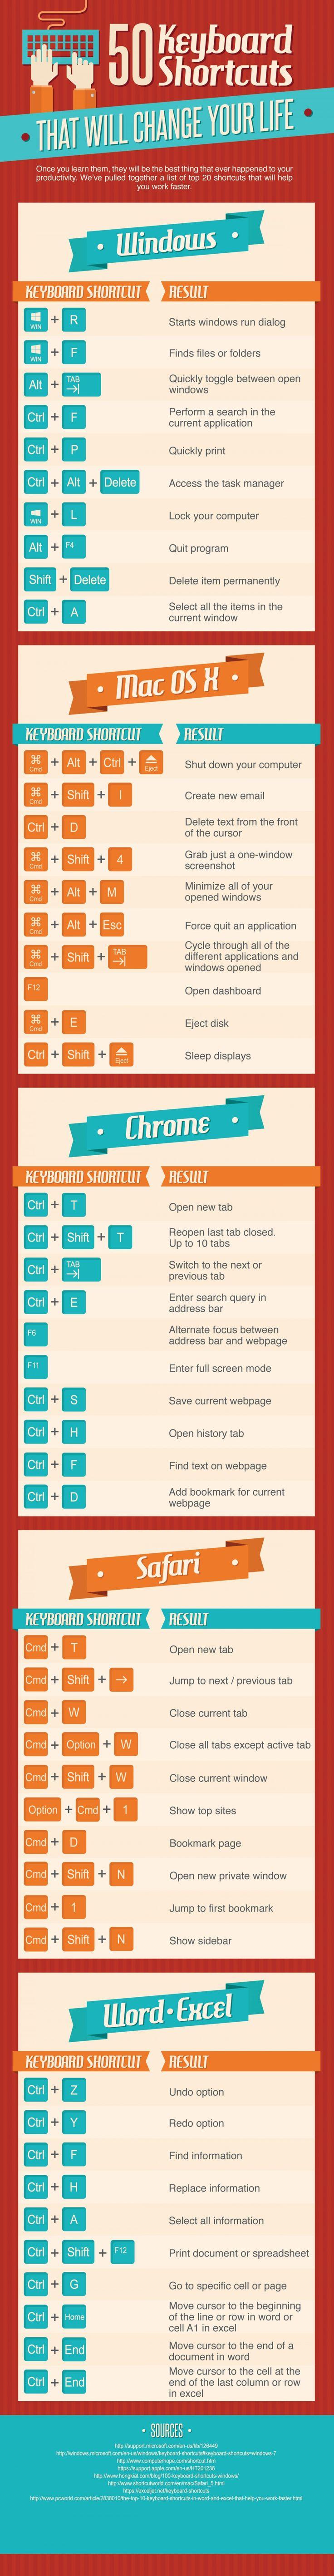 50 useful keyboard shortcuts. Re-pinned by #Europass